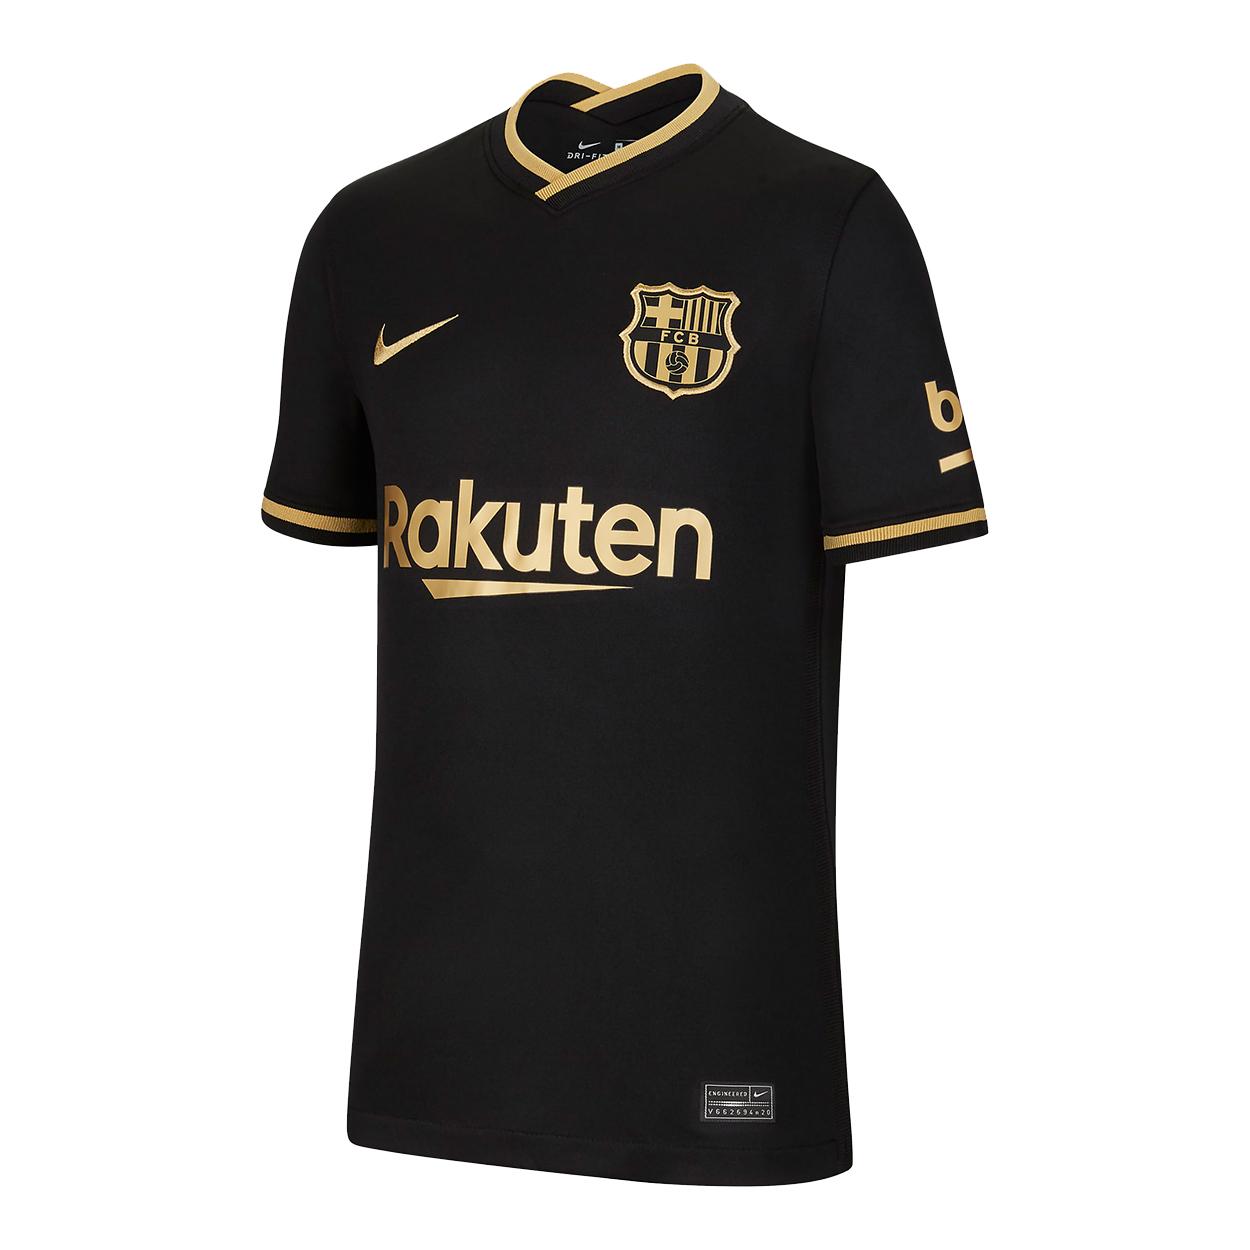 تیشرت ورزشی مردانه طرح بارسلونا کد away2021 غیر اصل